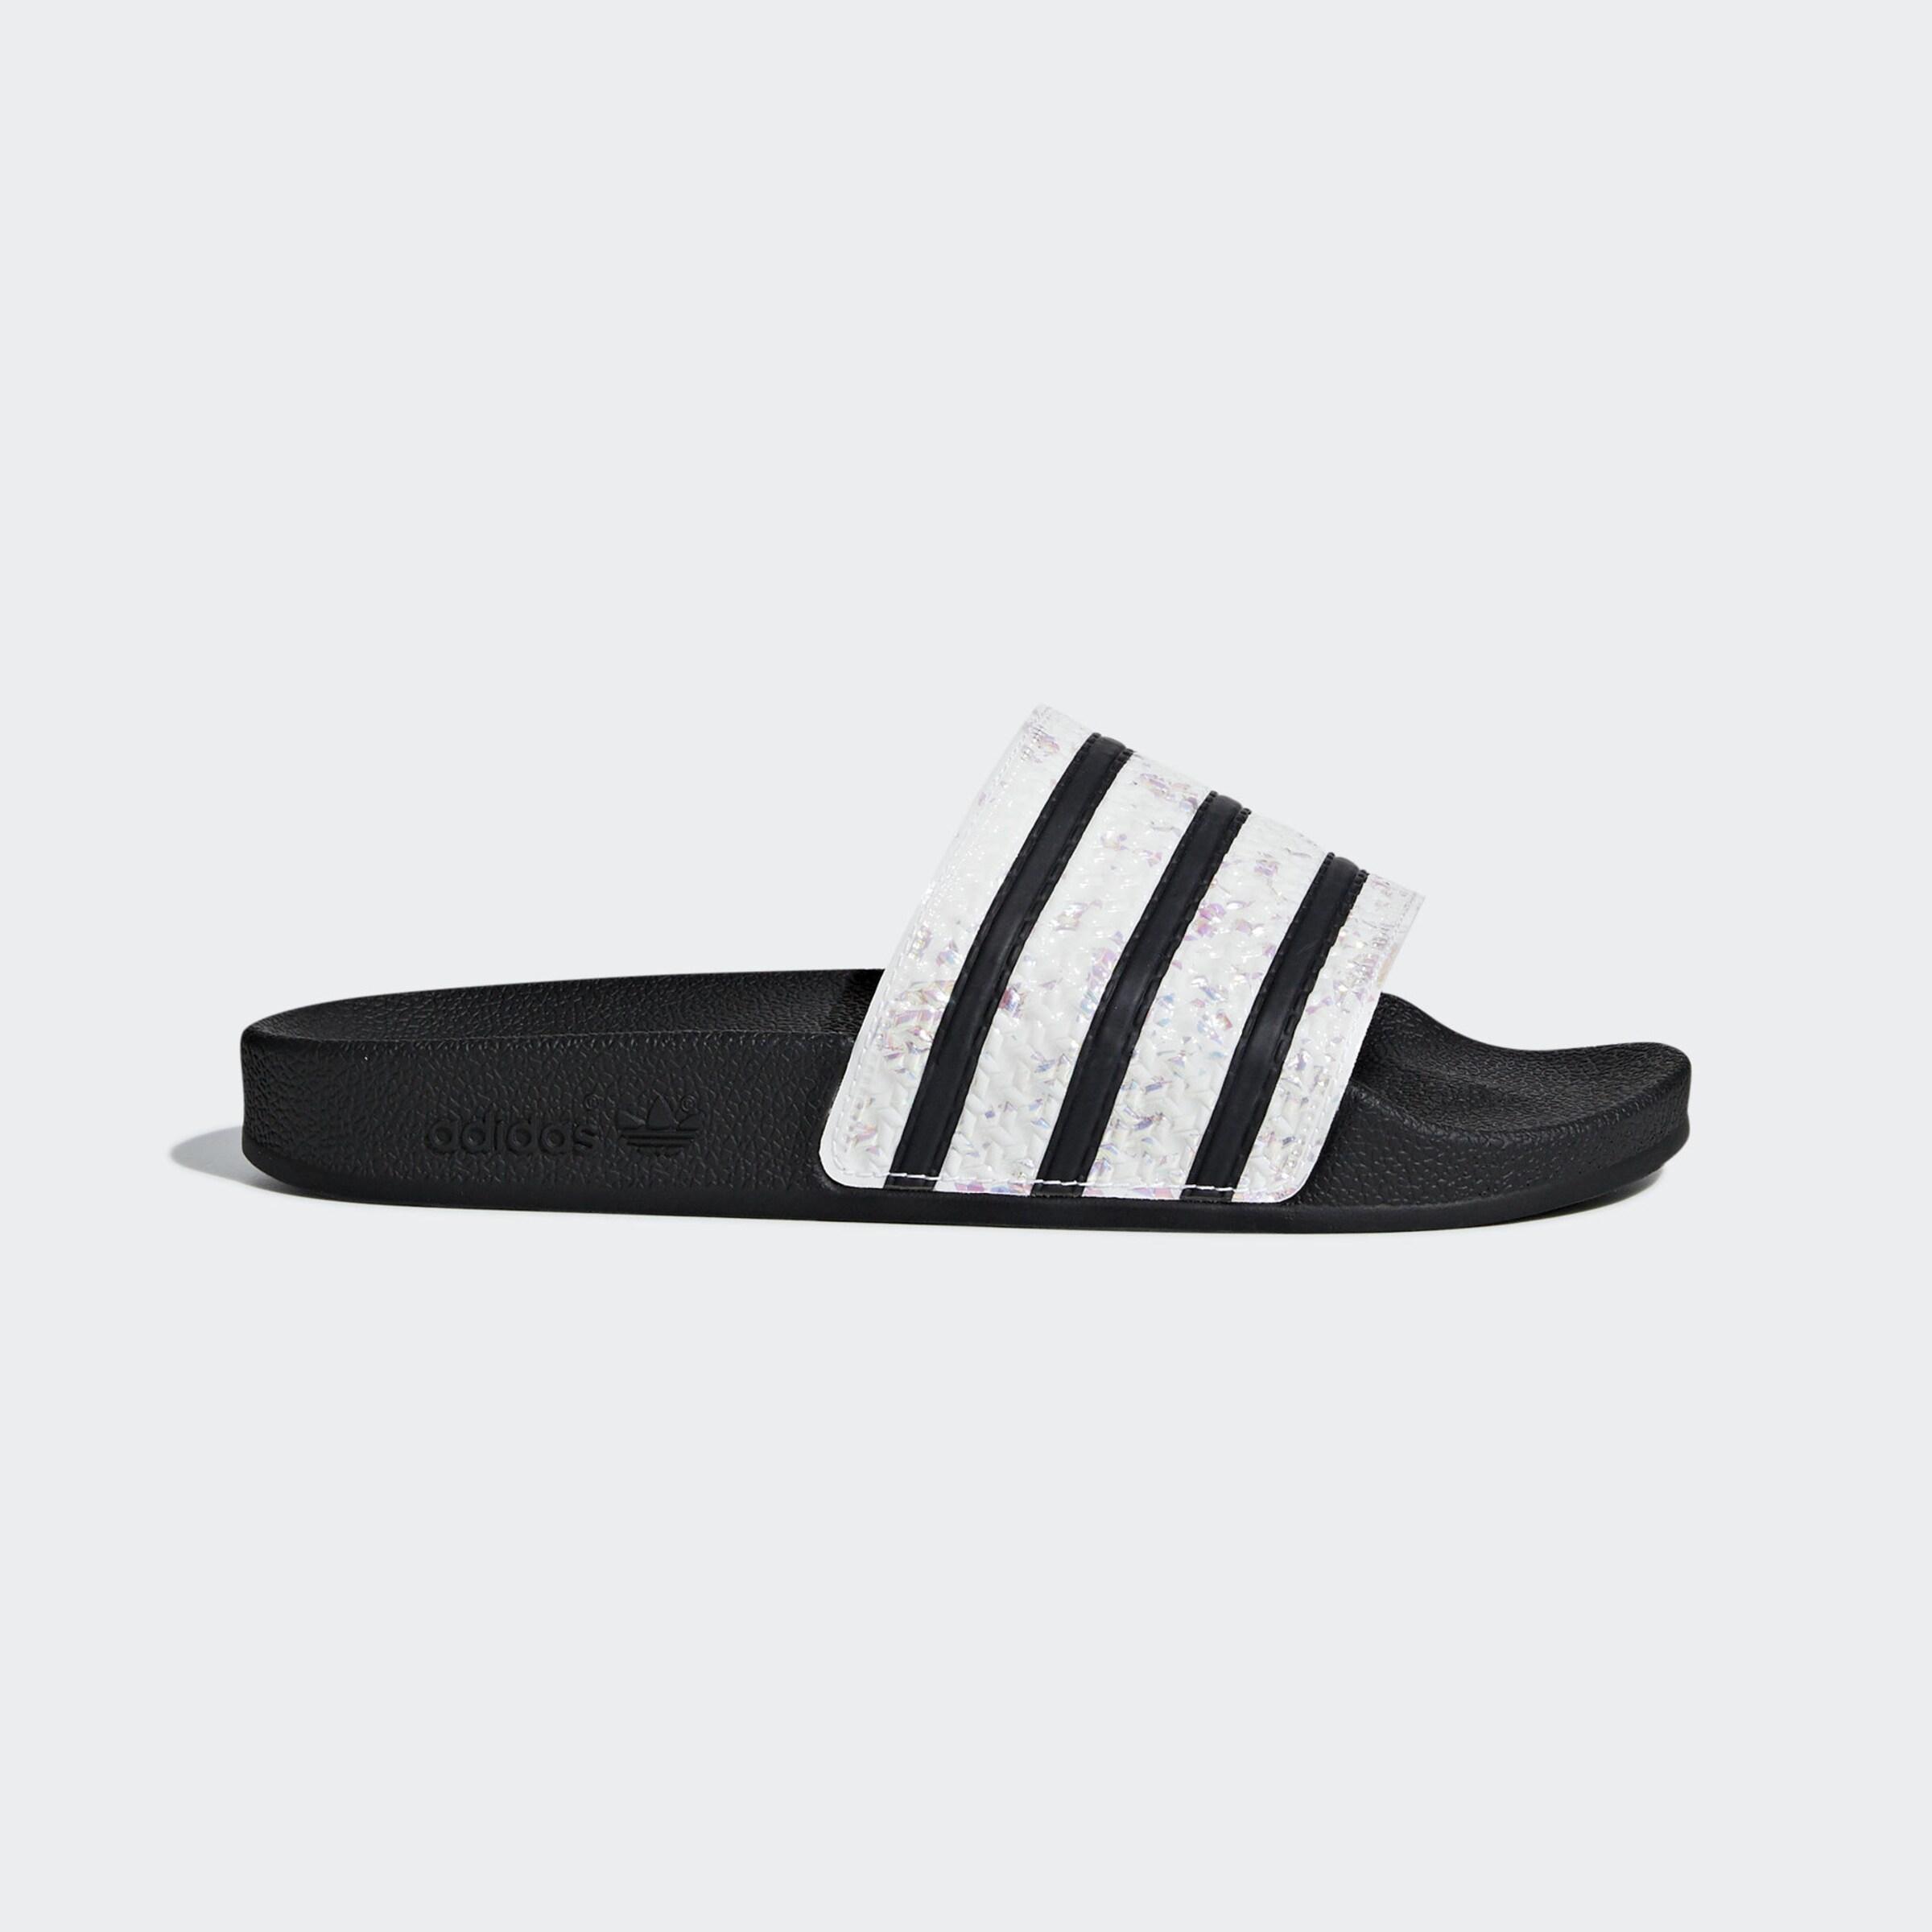 Mule En En NoirBlanc Originals Originals NoirBlanc Adidas Adidas Mule qzSGVUpM